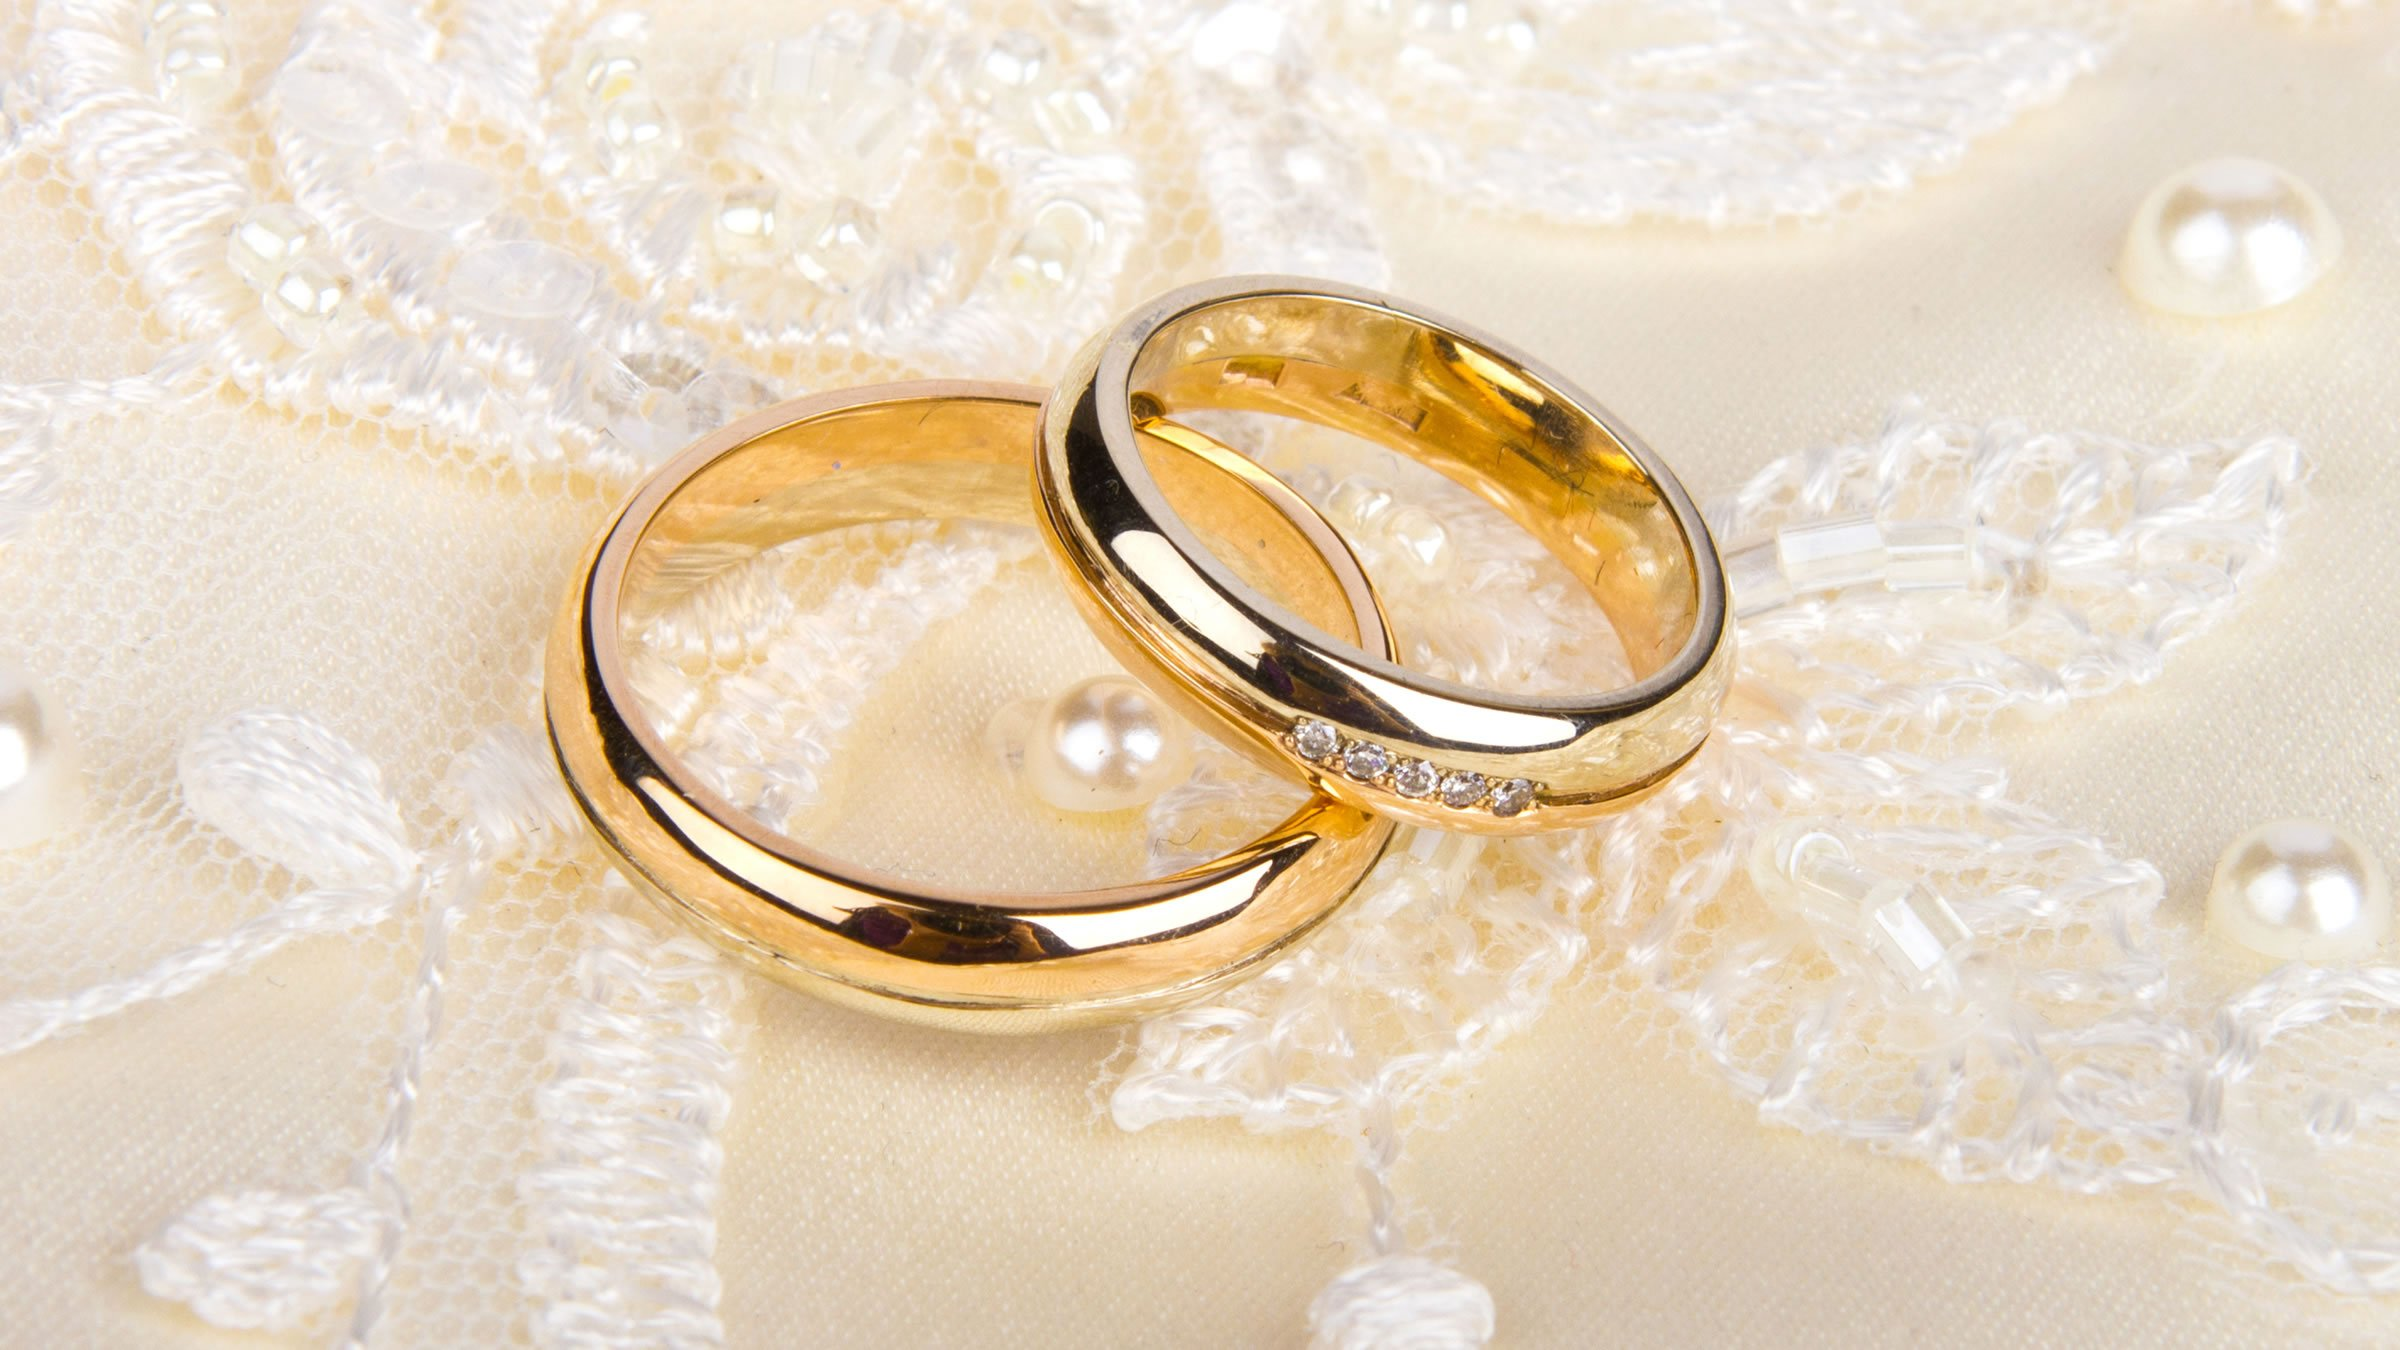 Matrimonio In Lituania : La importancia del matrimonio en italia